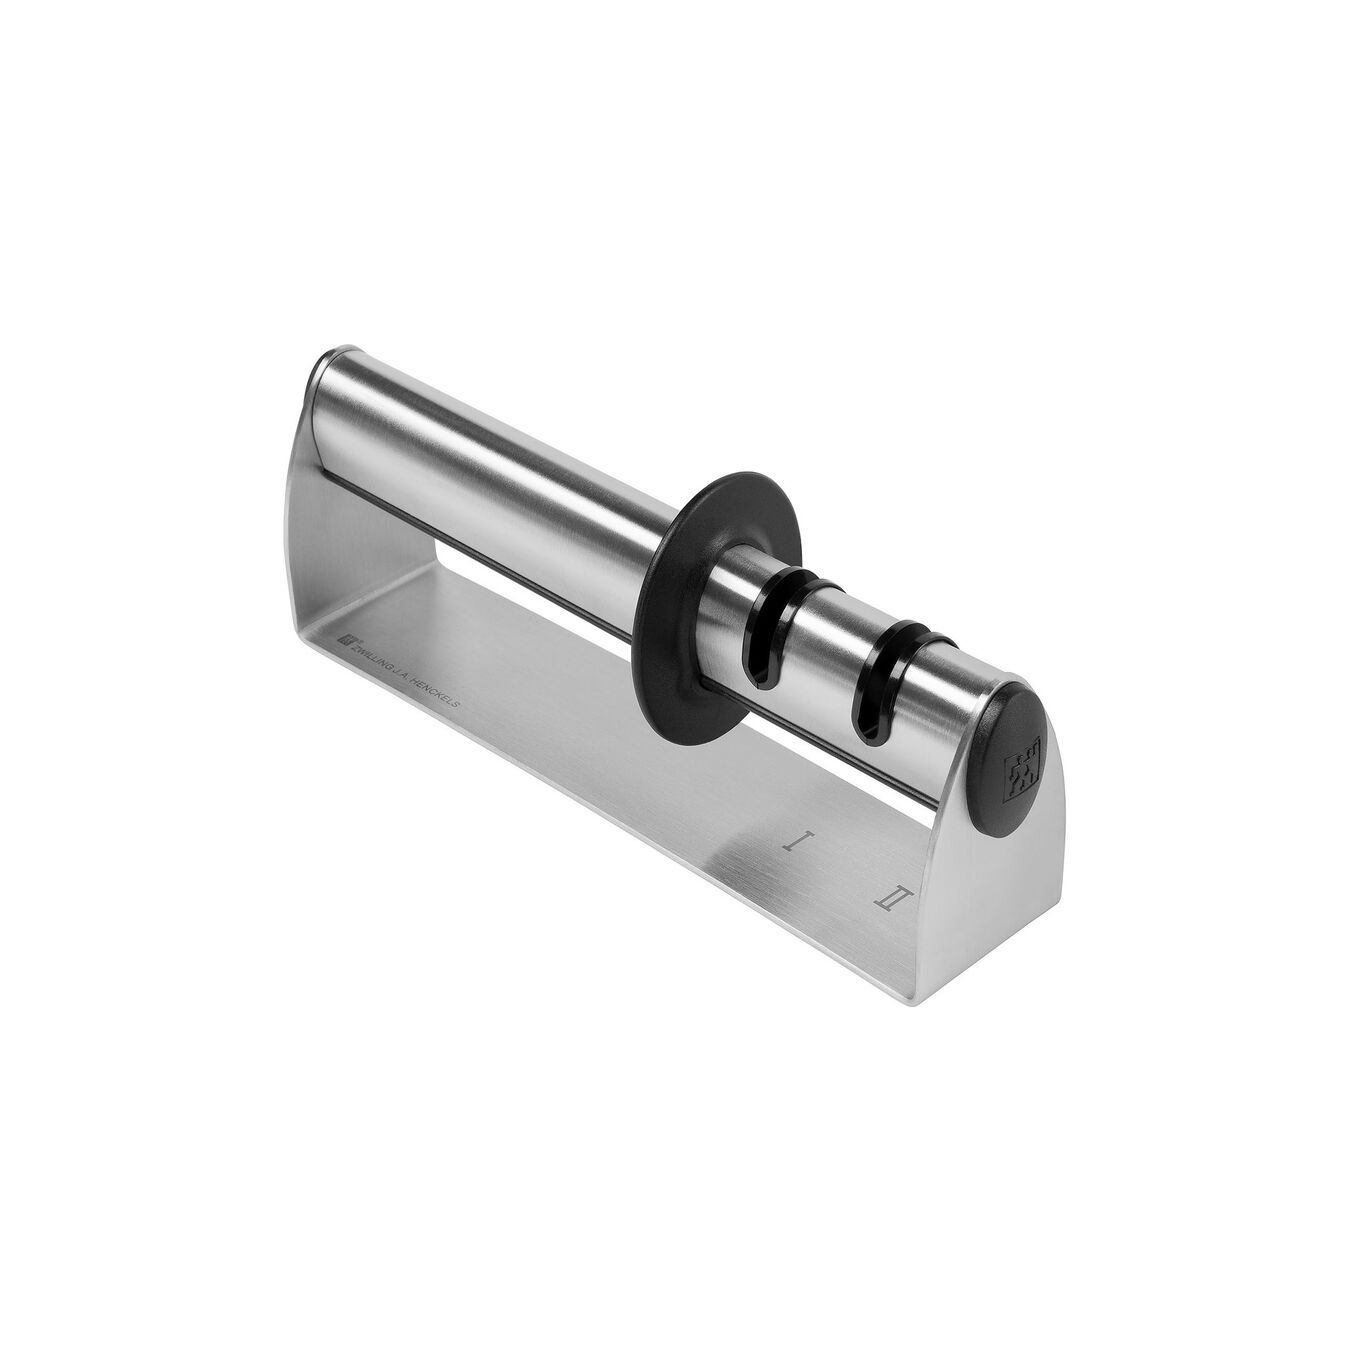 Duo Stainless Steel Handheld Knife Sharpener,,large 4